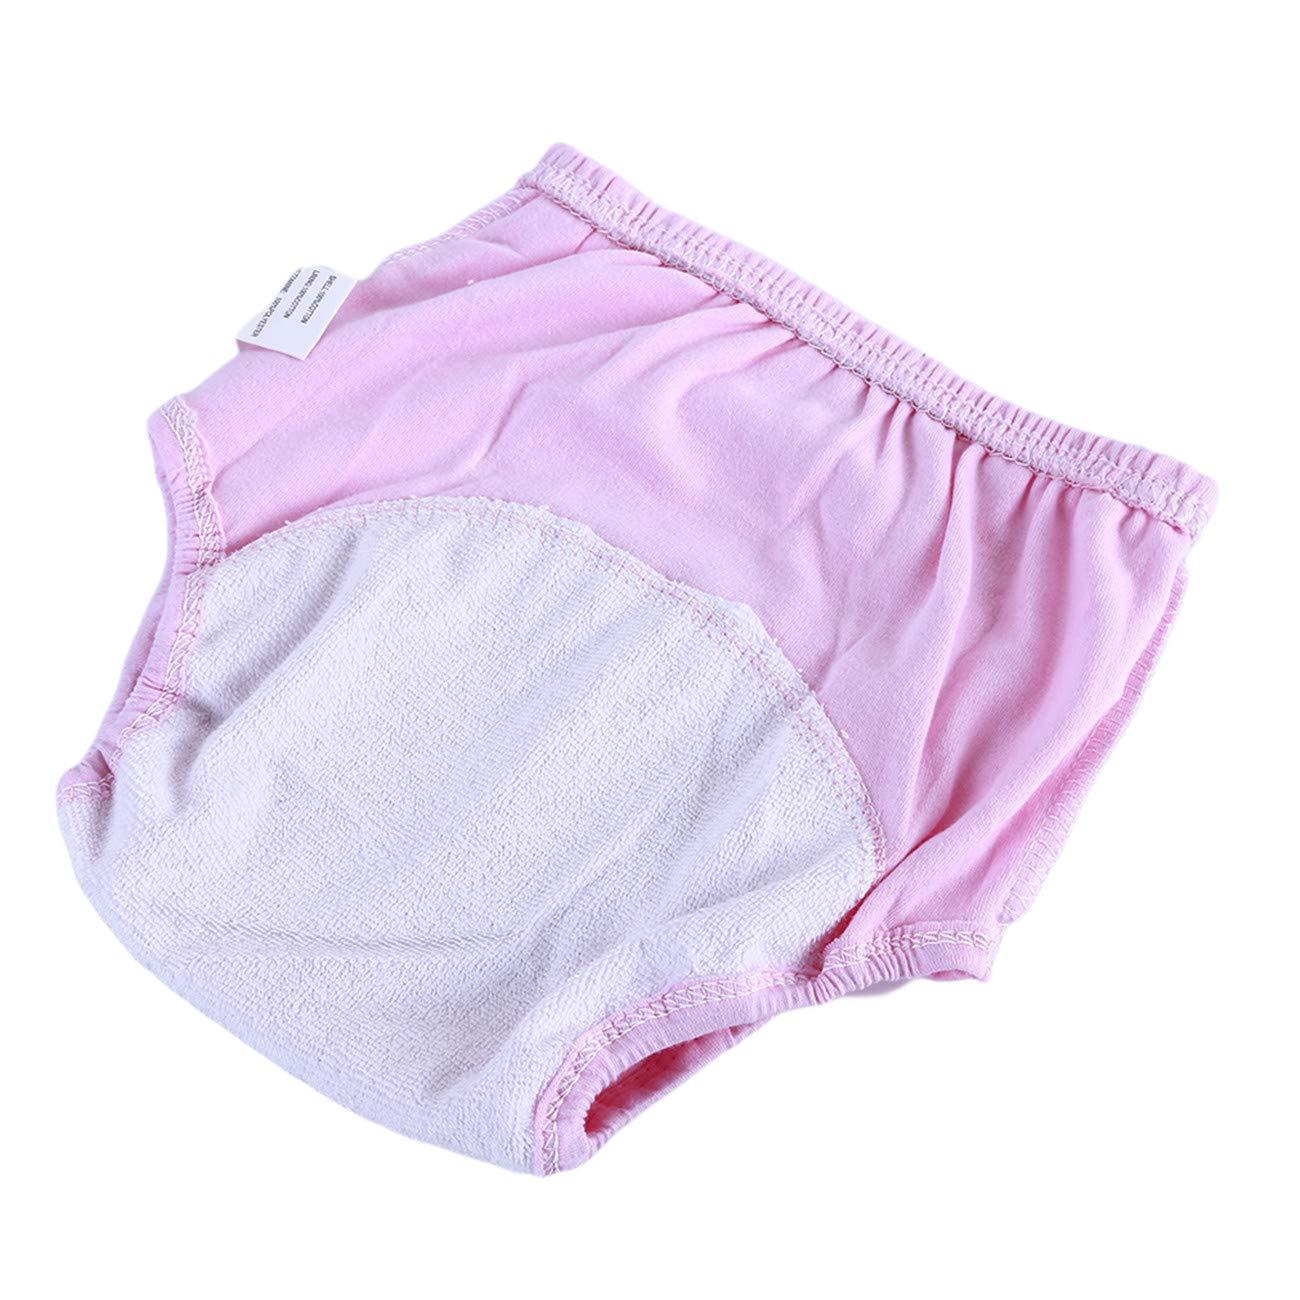 ZALING Baby Learning Pants Waterproof Panties Baby Cotton Training Pantscloth Diaper Car